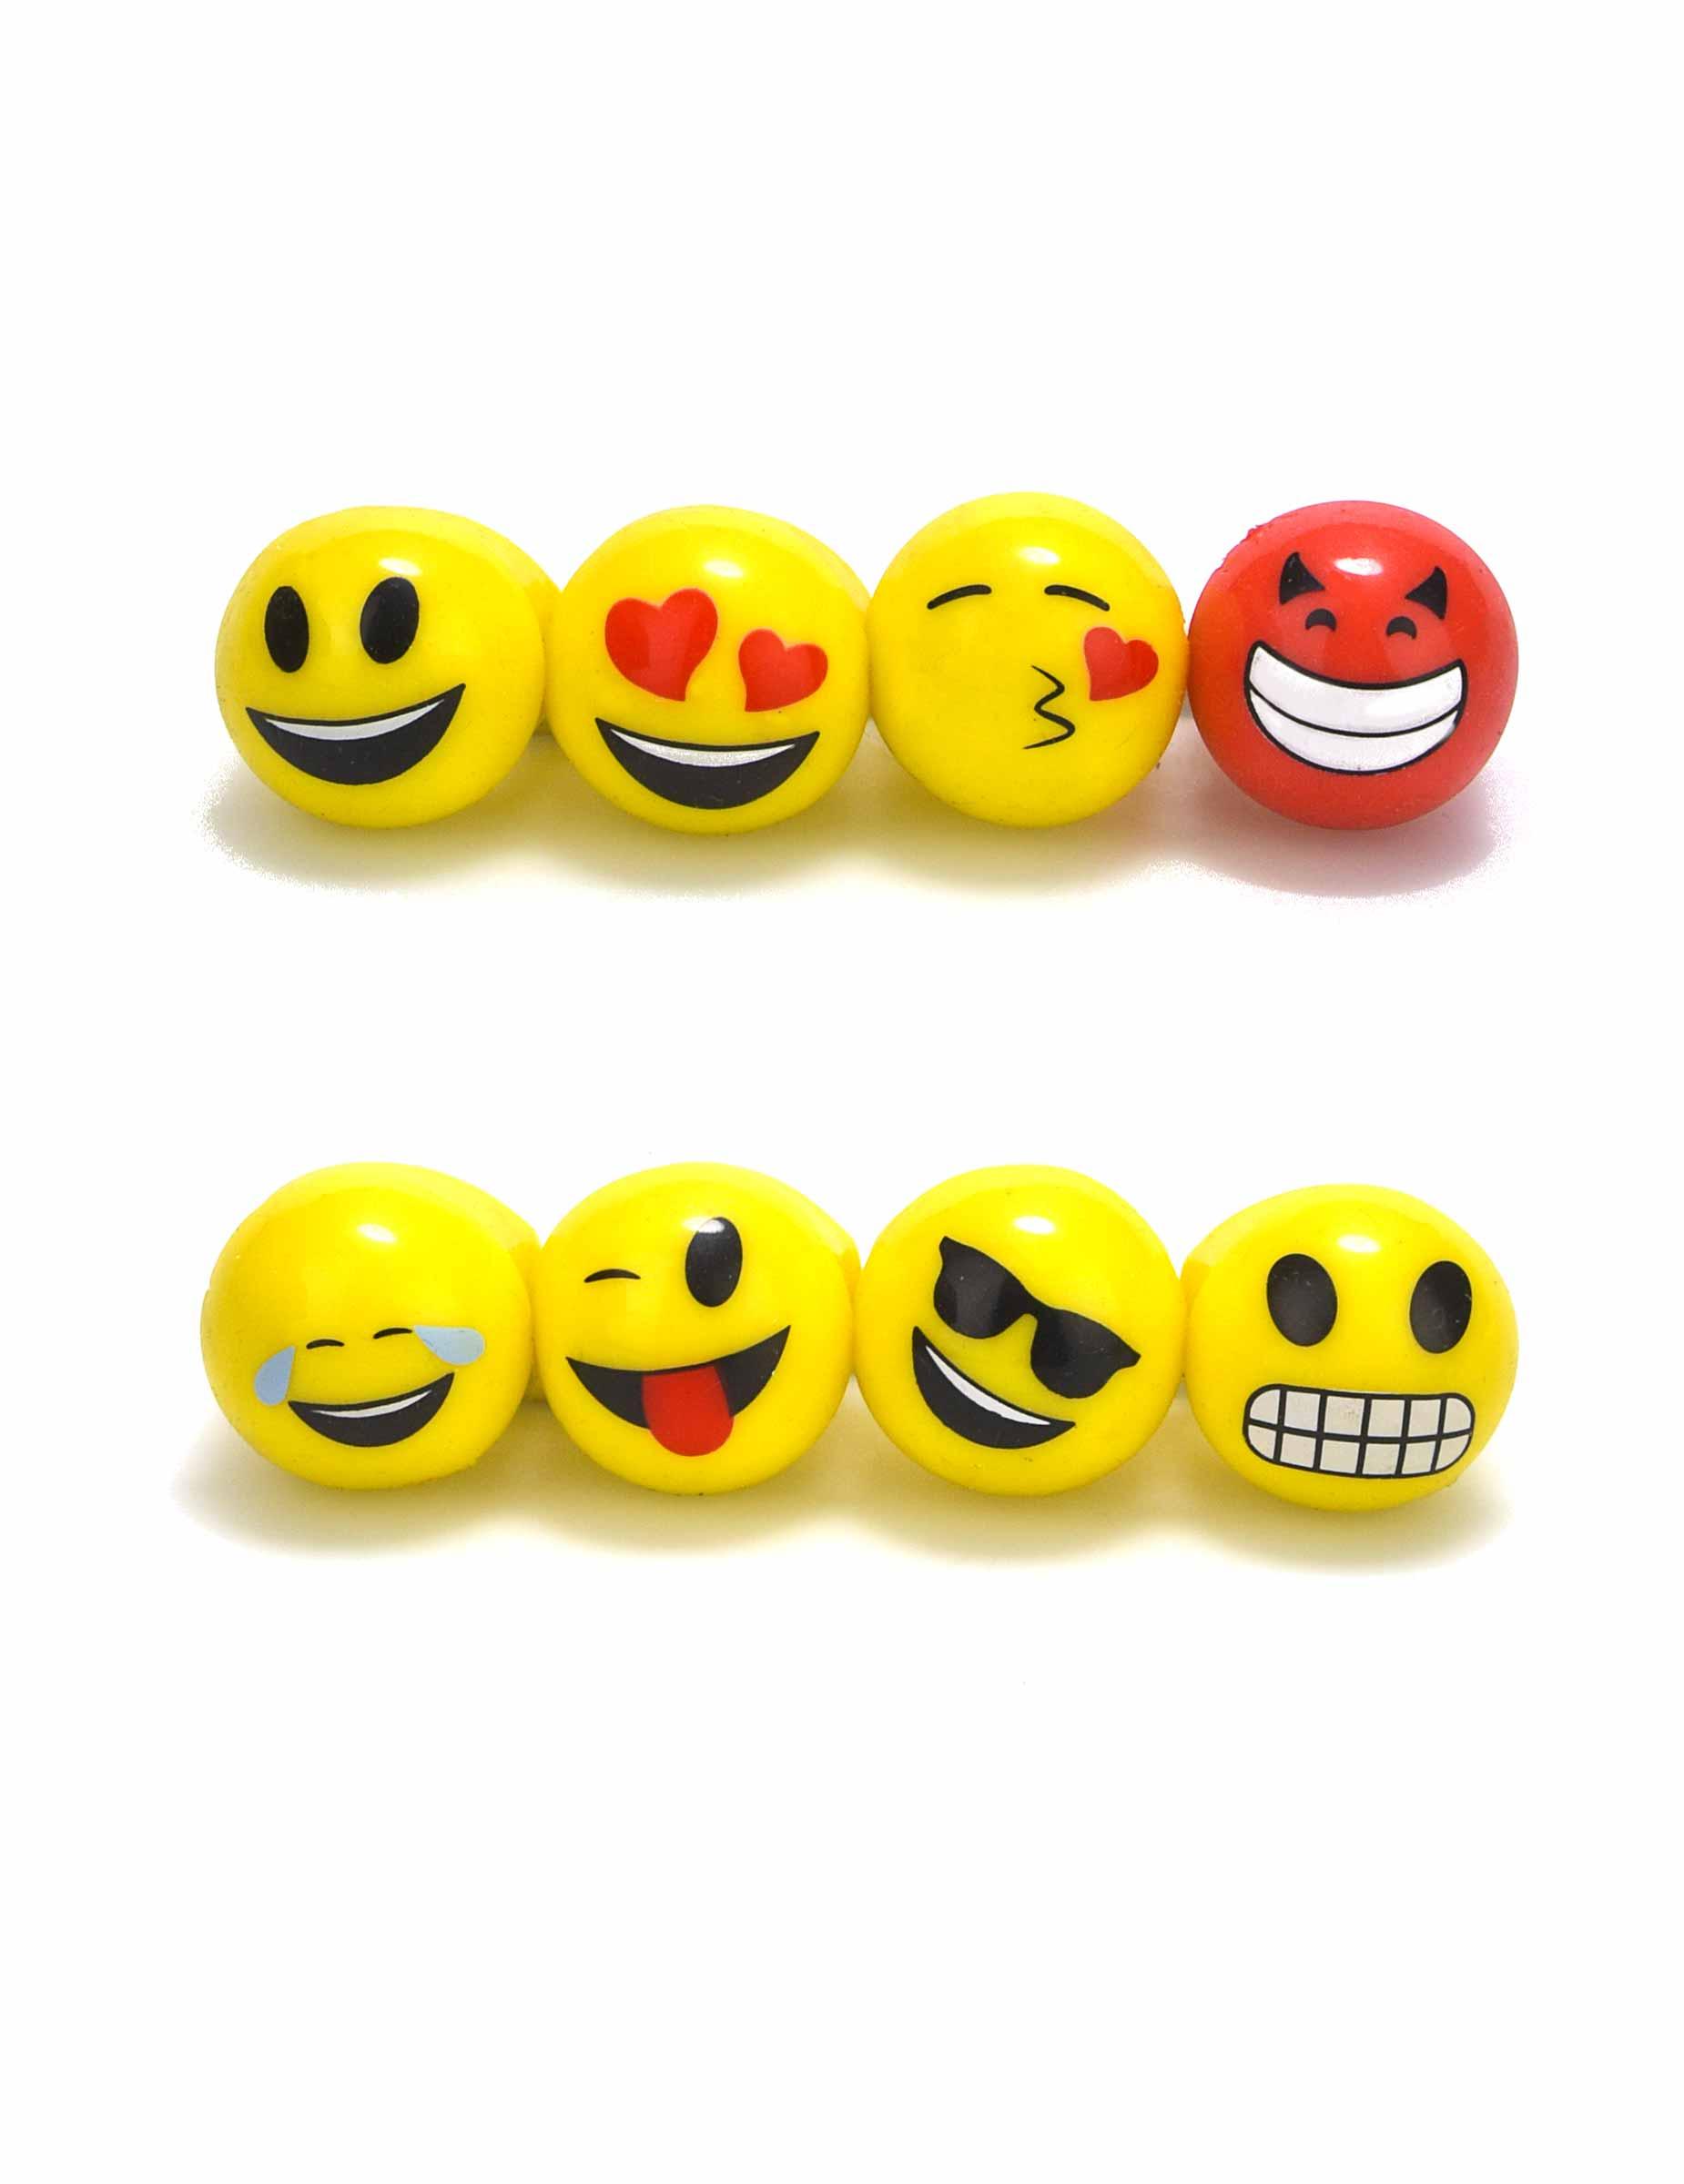 Emoji Led Ring Lizenzartikel Bunt Gunstige Faschings Accessoires